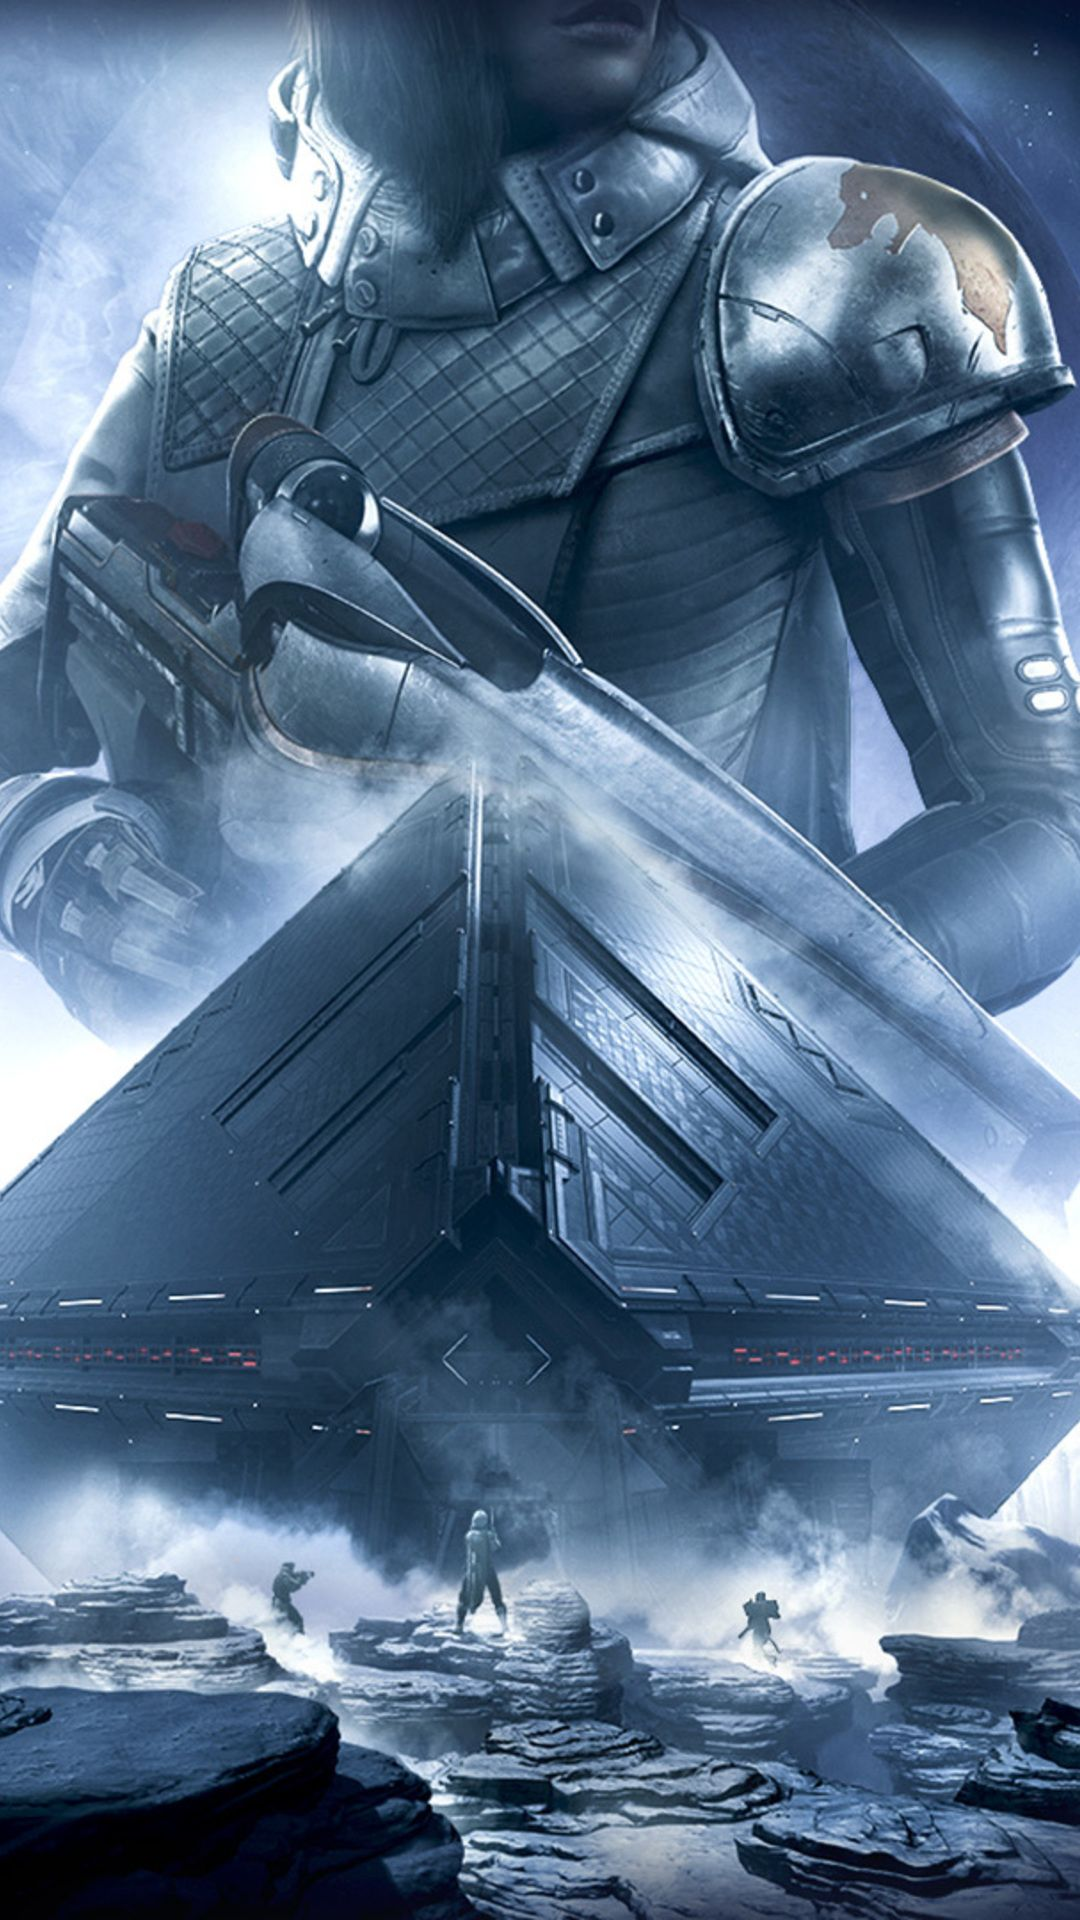 Destiny 2 Forsaken Wallpapers » Hupages » Download Iphone Wallpapers | Wallpaper, Iphone ...